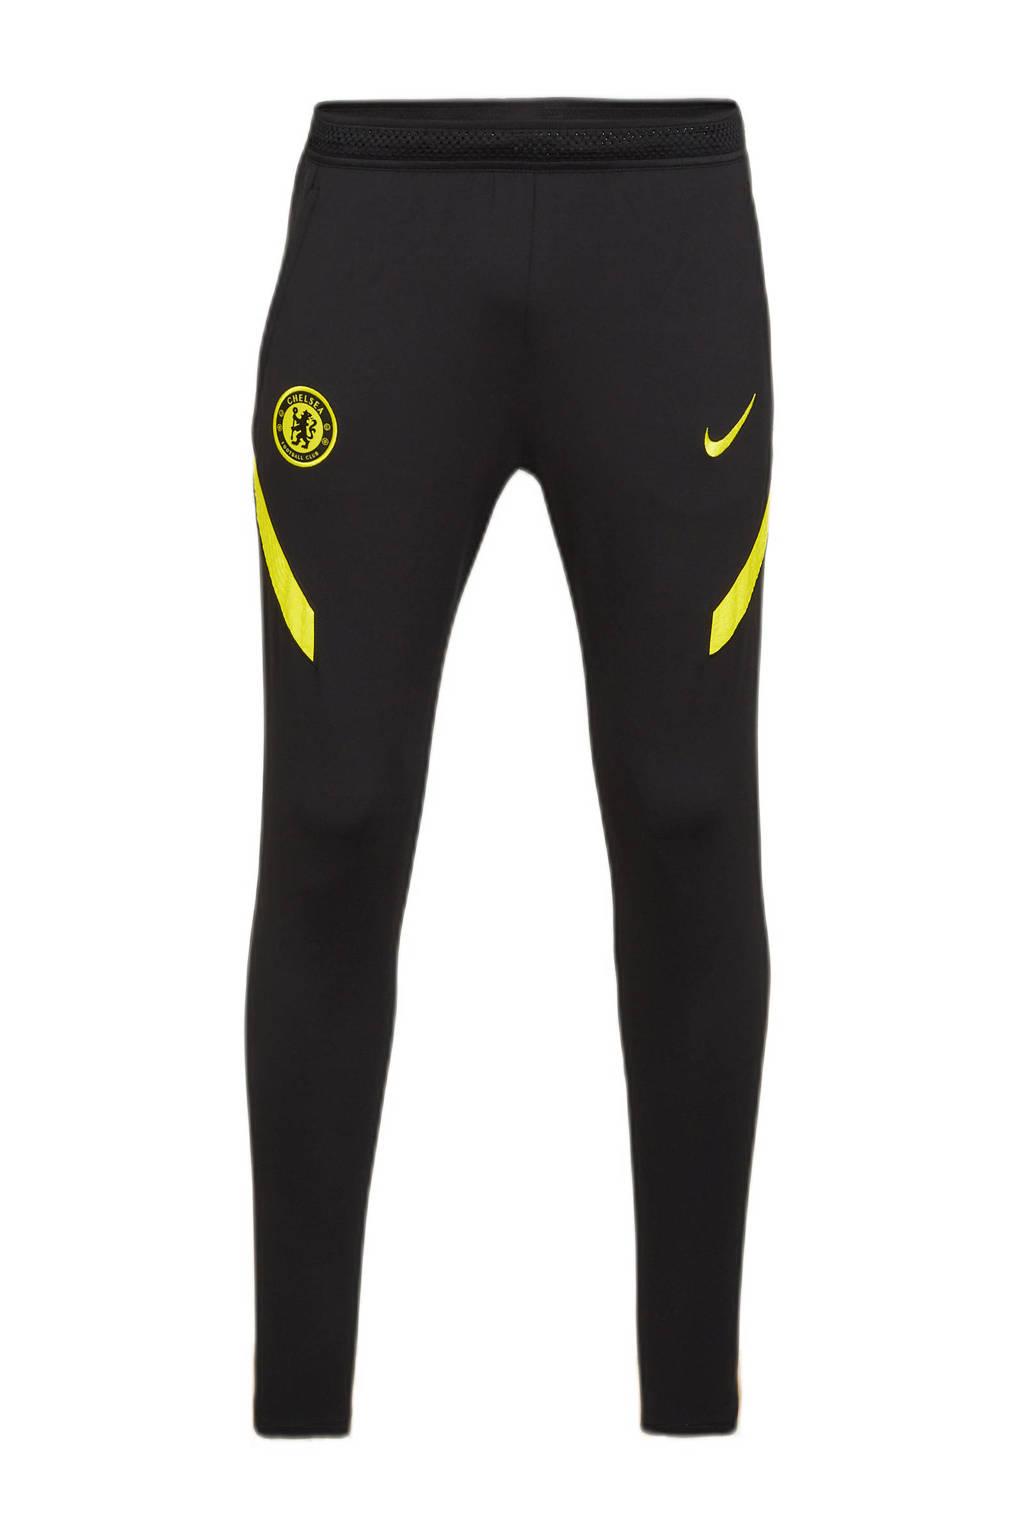 Nike Senior Chelsea  FC voetbalbroek zwart/geel, Zwart/geel